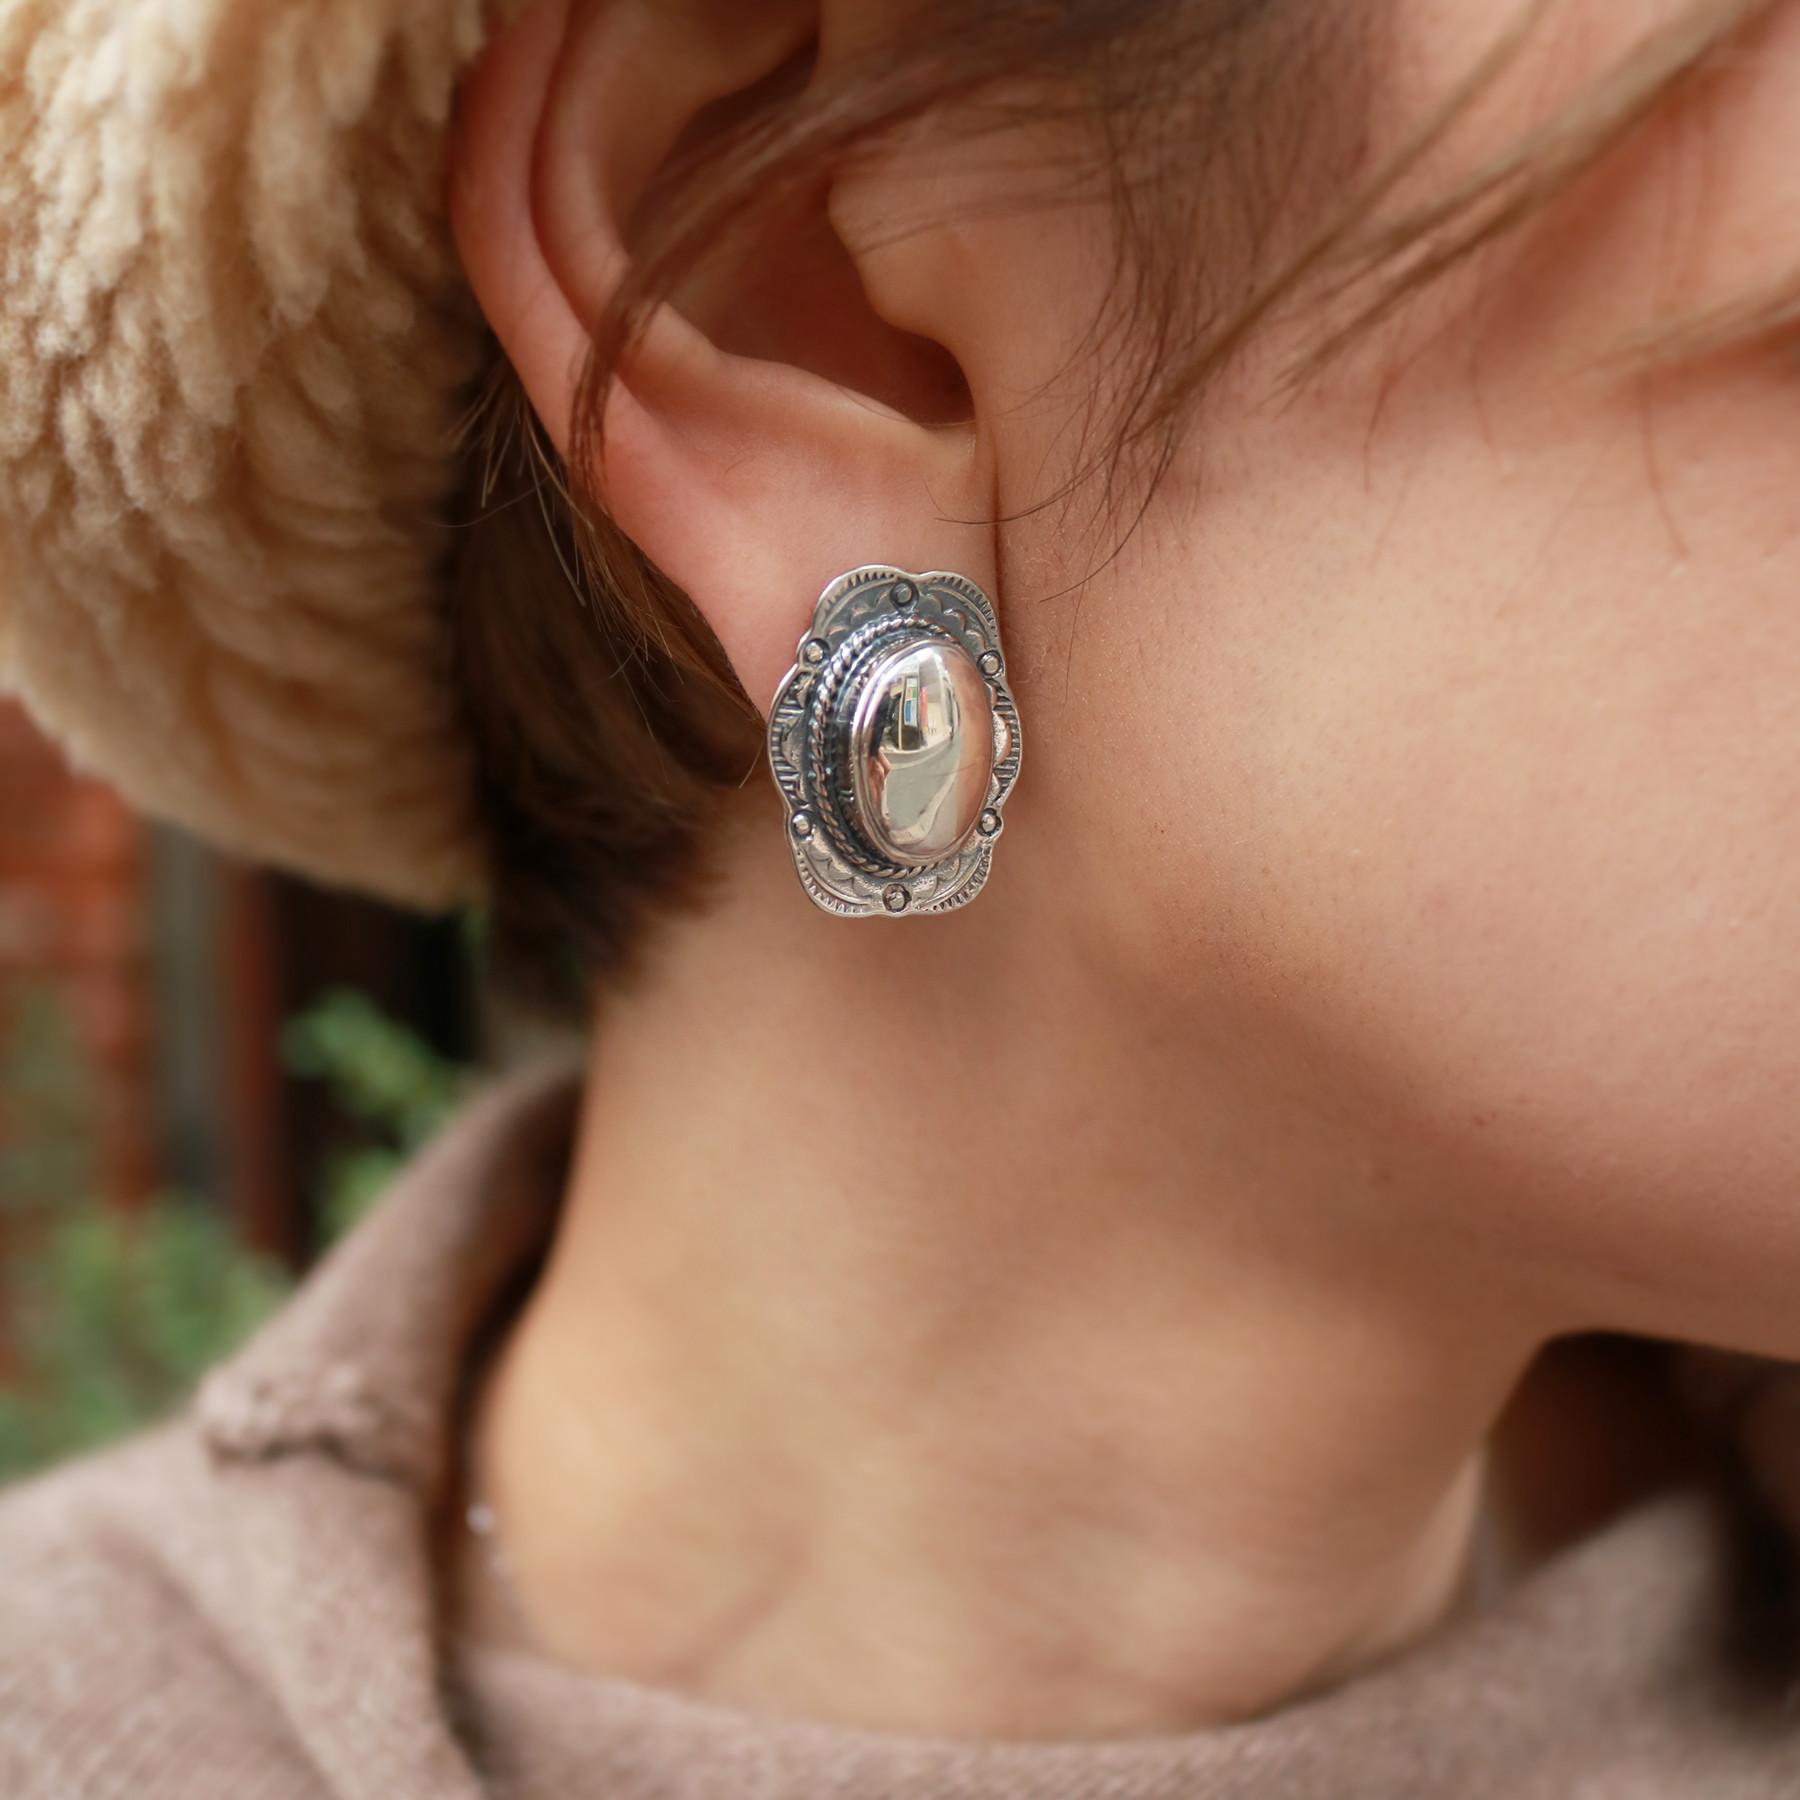 Silver925 Native Earring